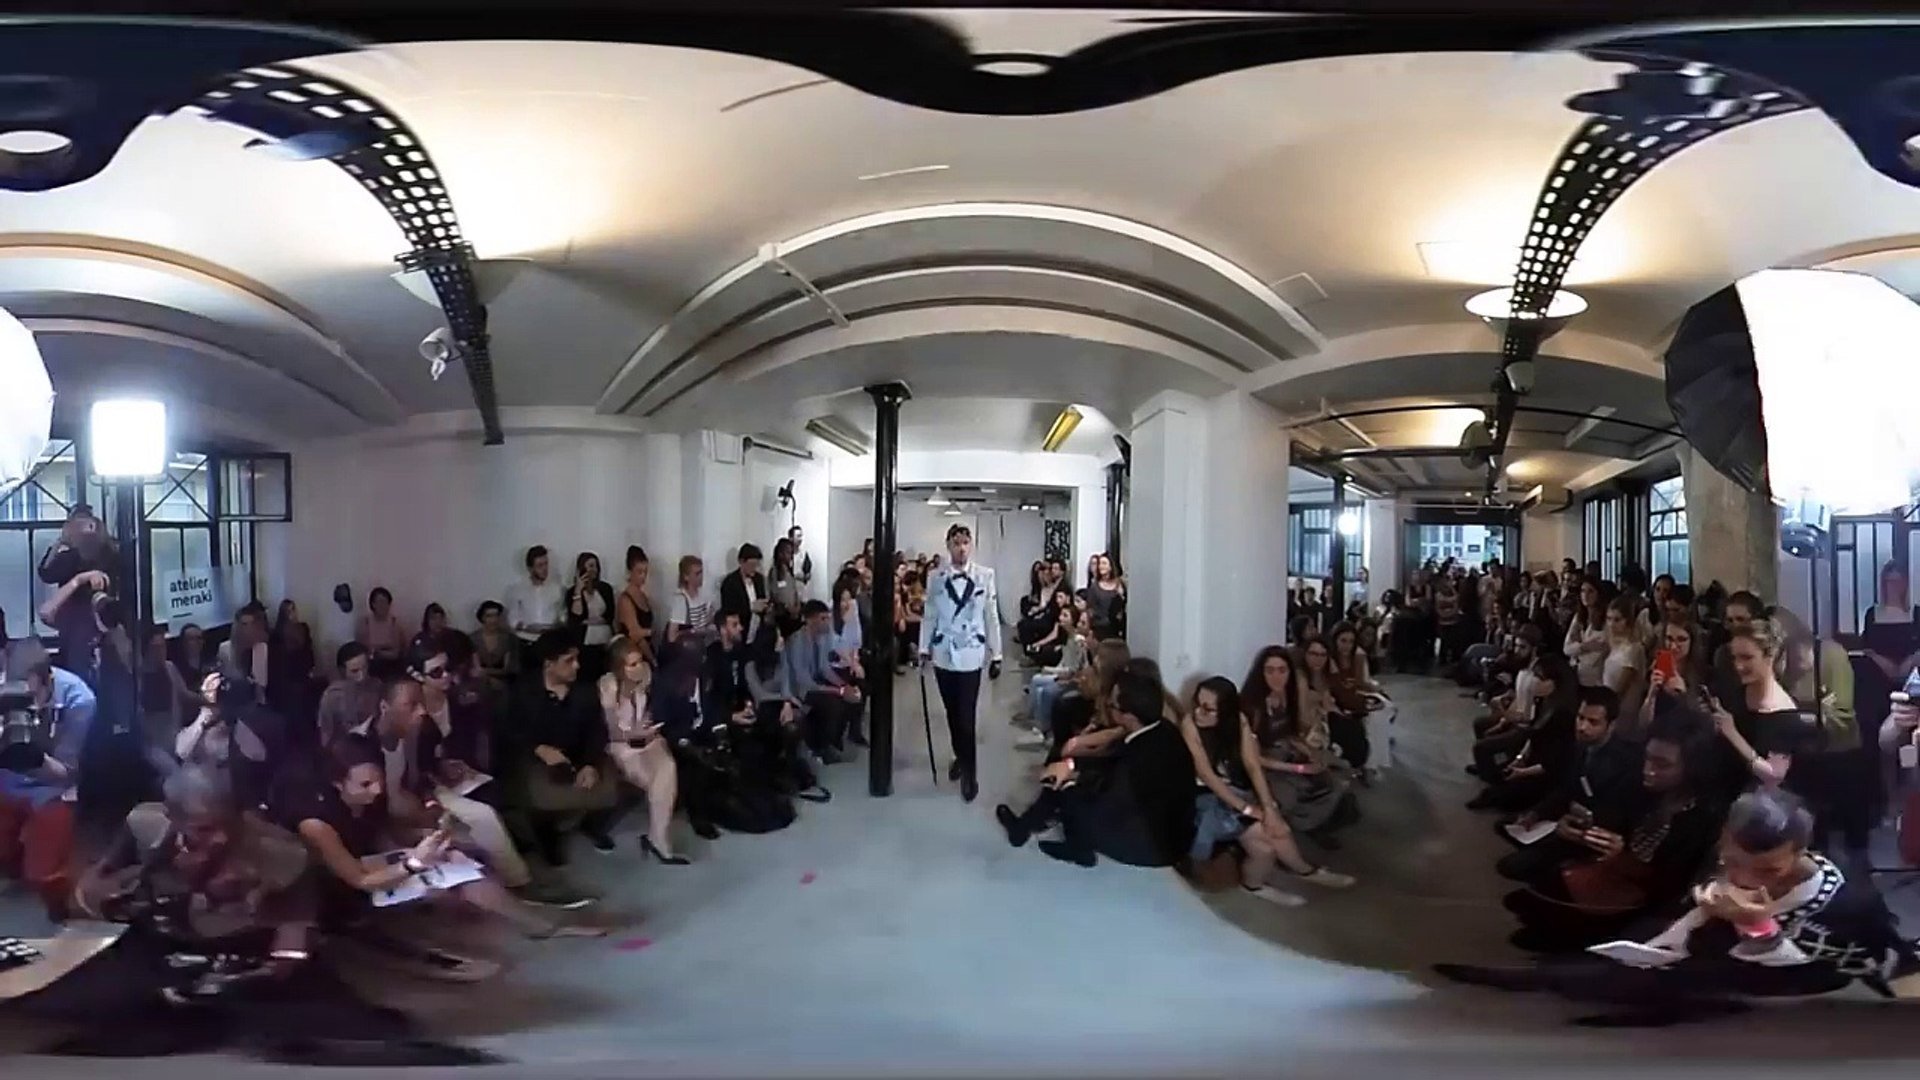 Paris Fashion week 2016 - 360 Fashion show